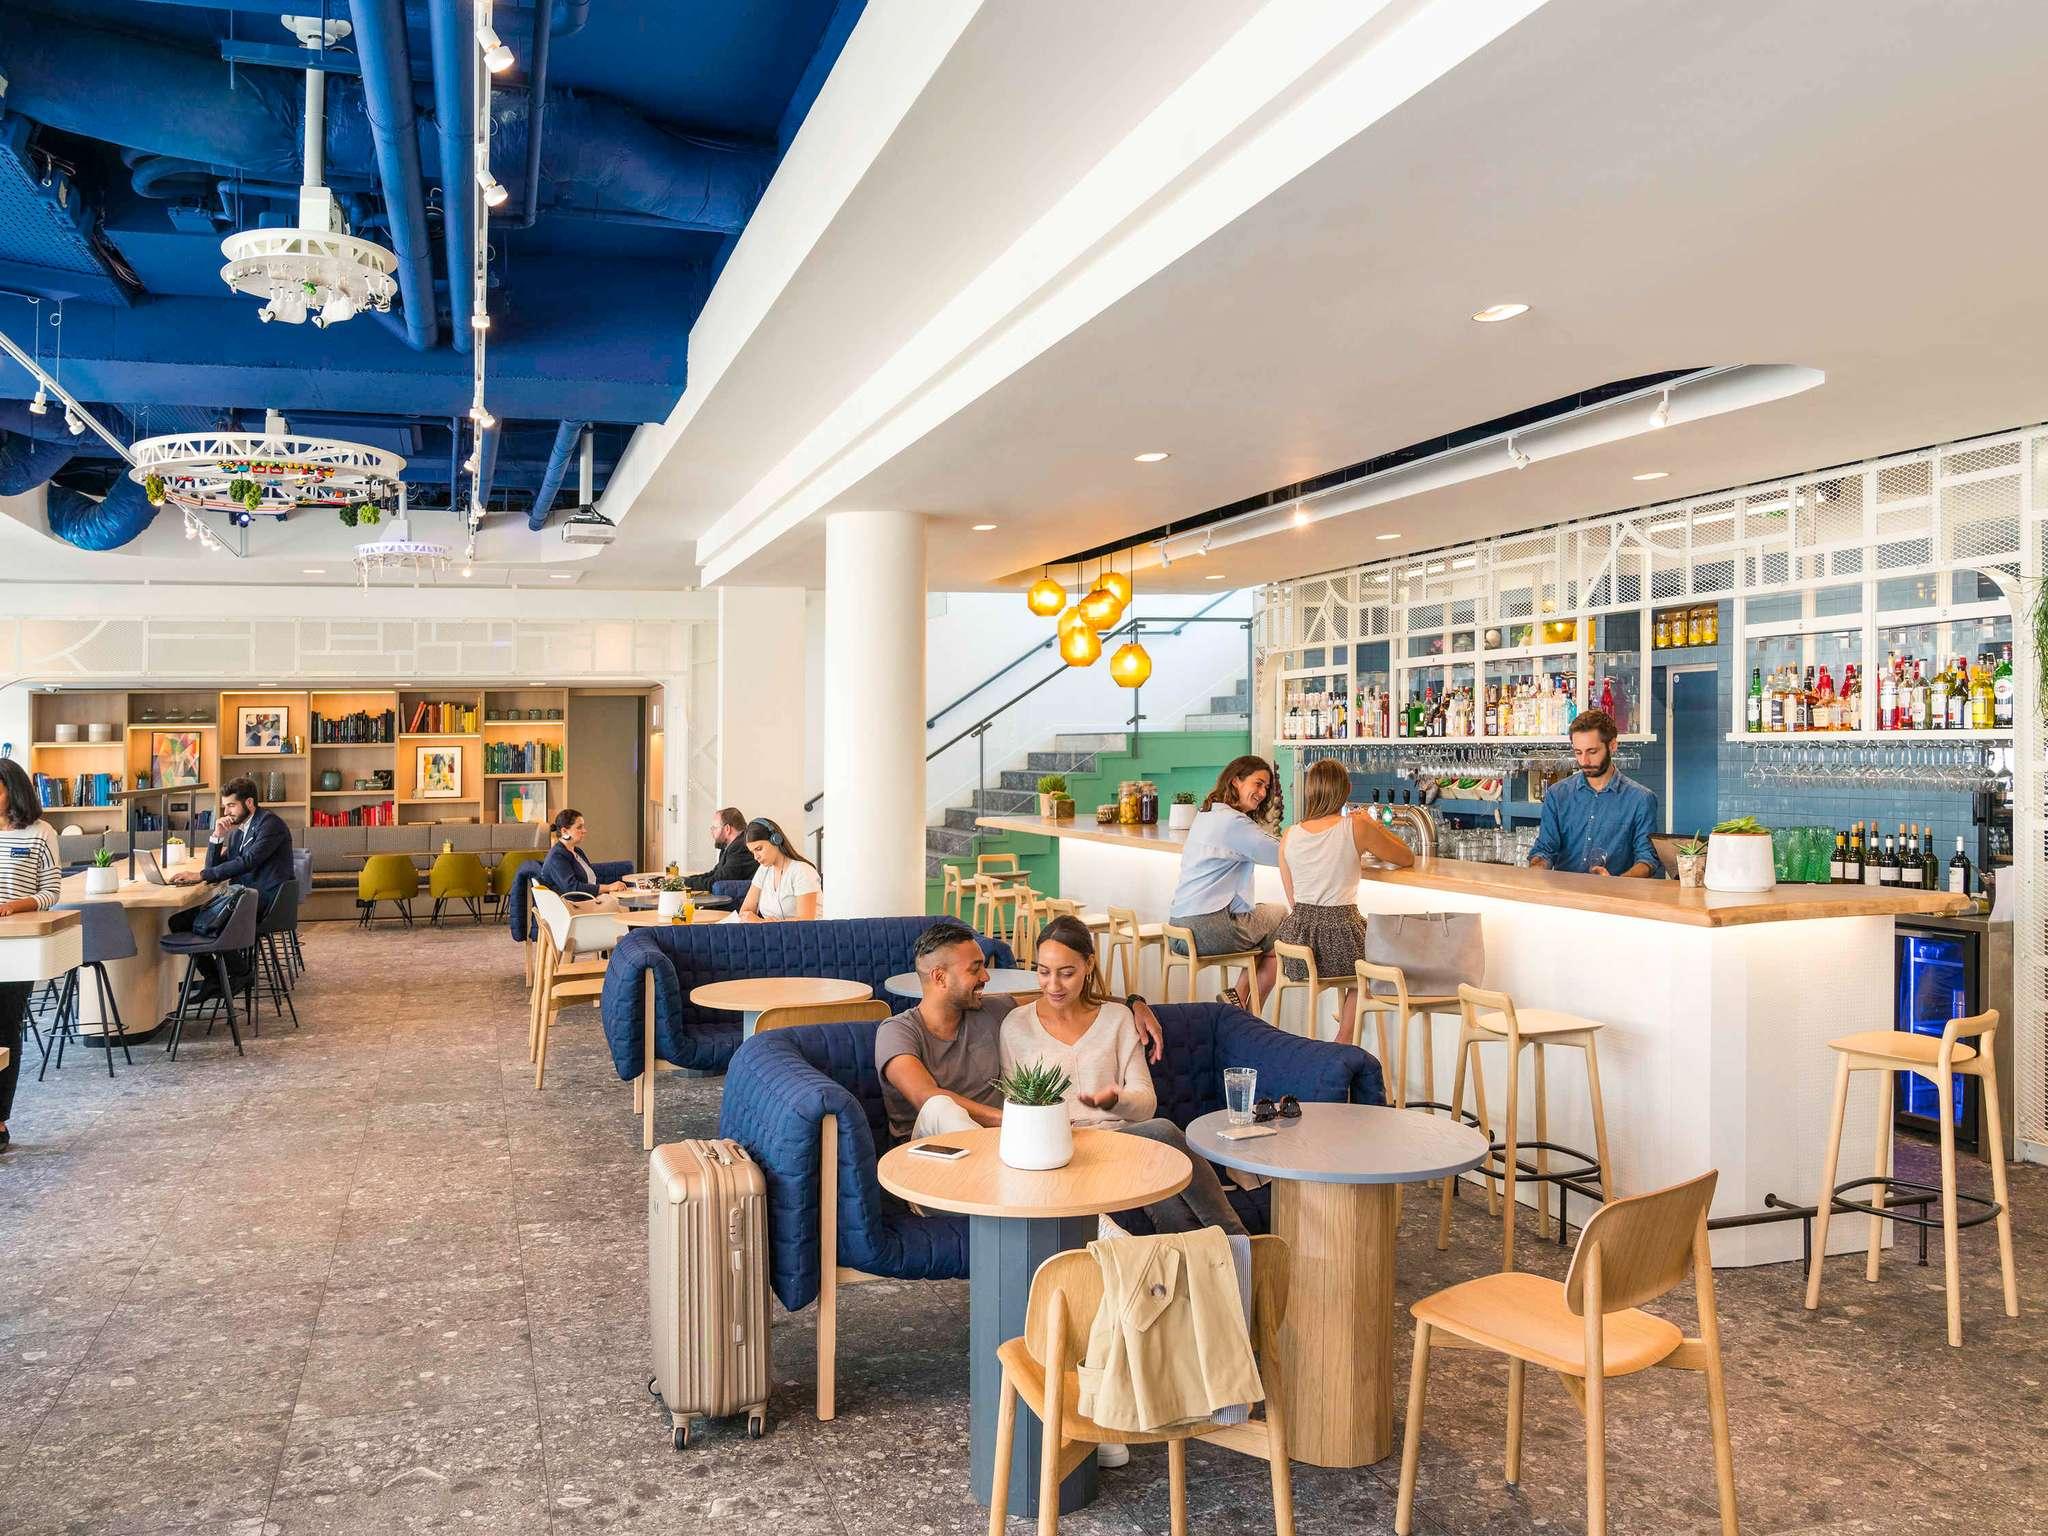 Hotel – Novotel Paris Centre Gare Montparnasse